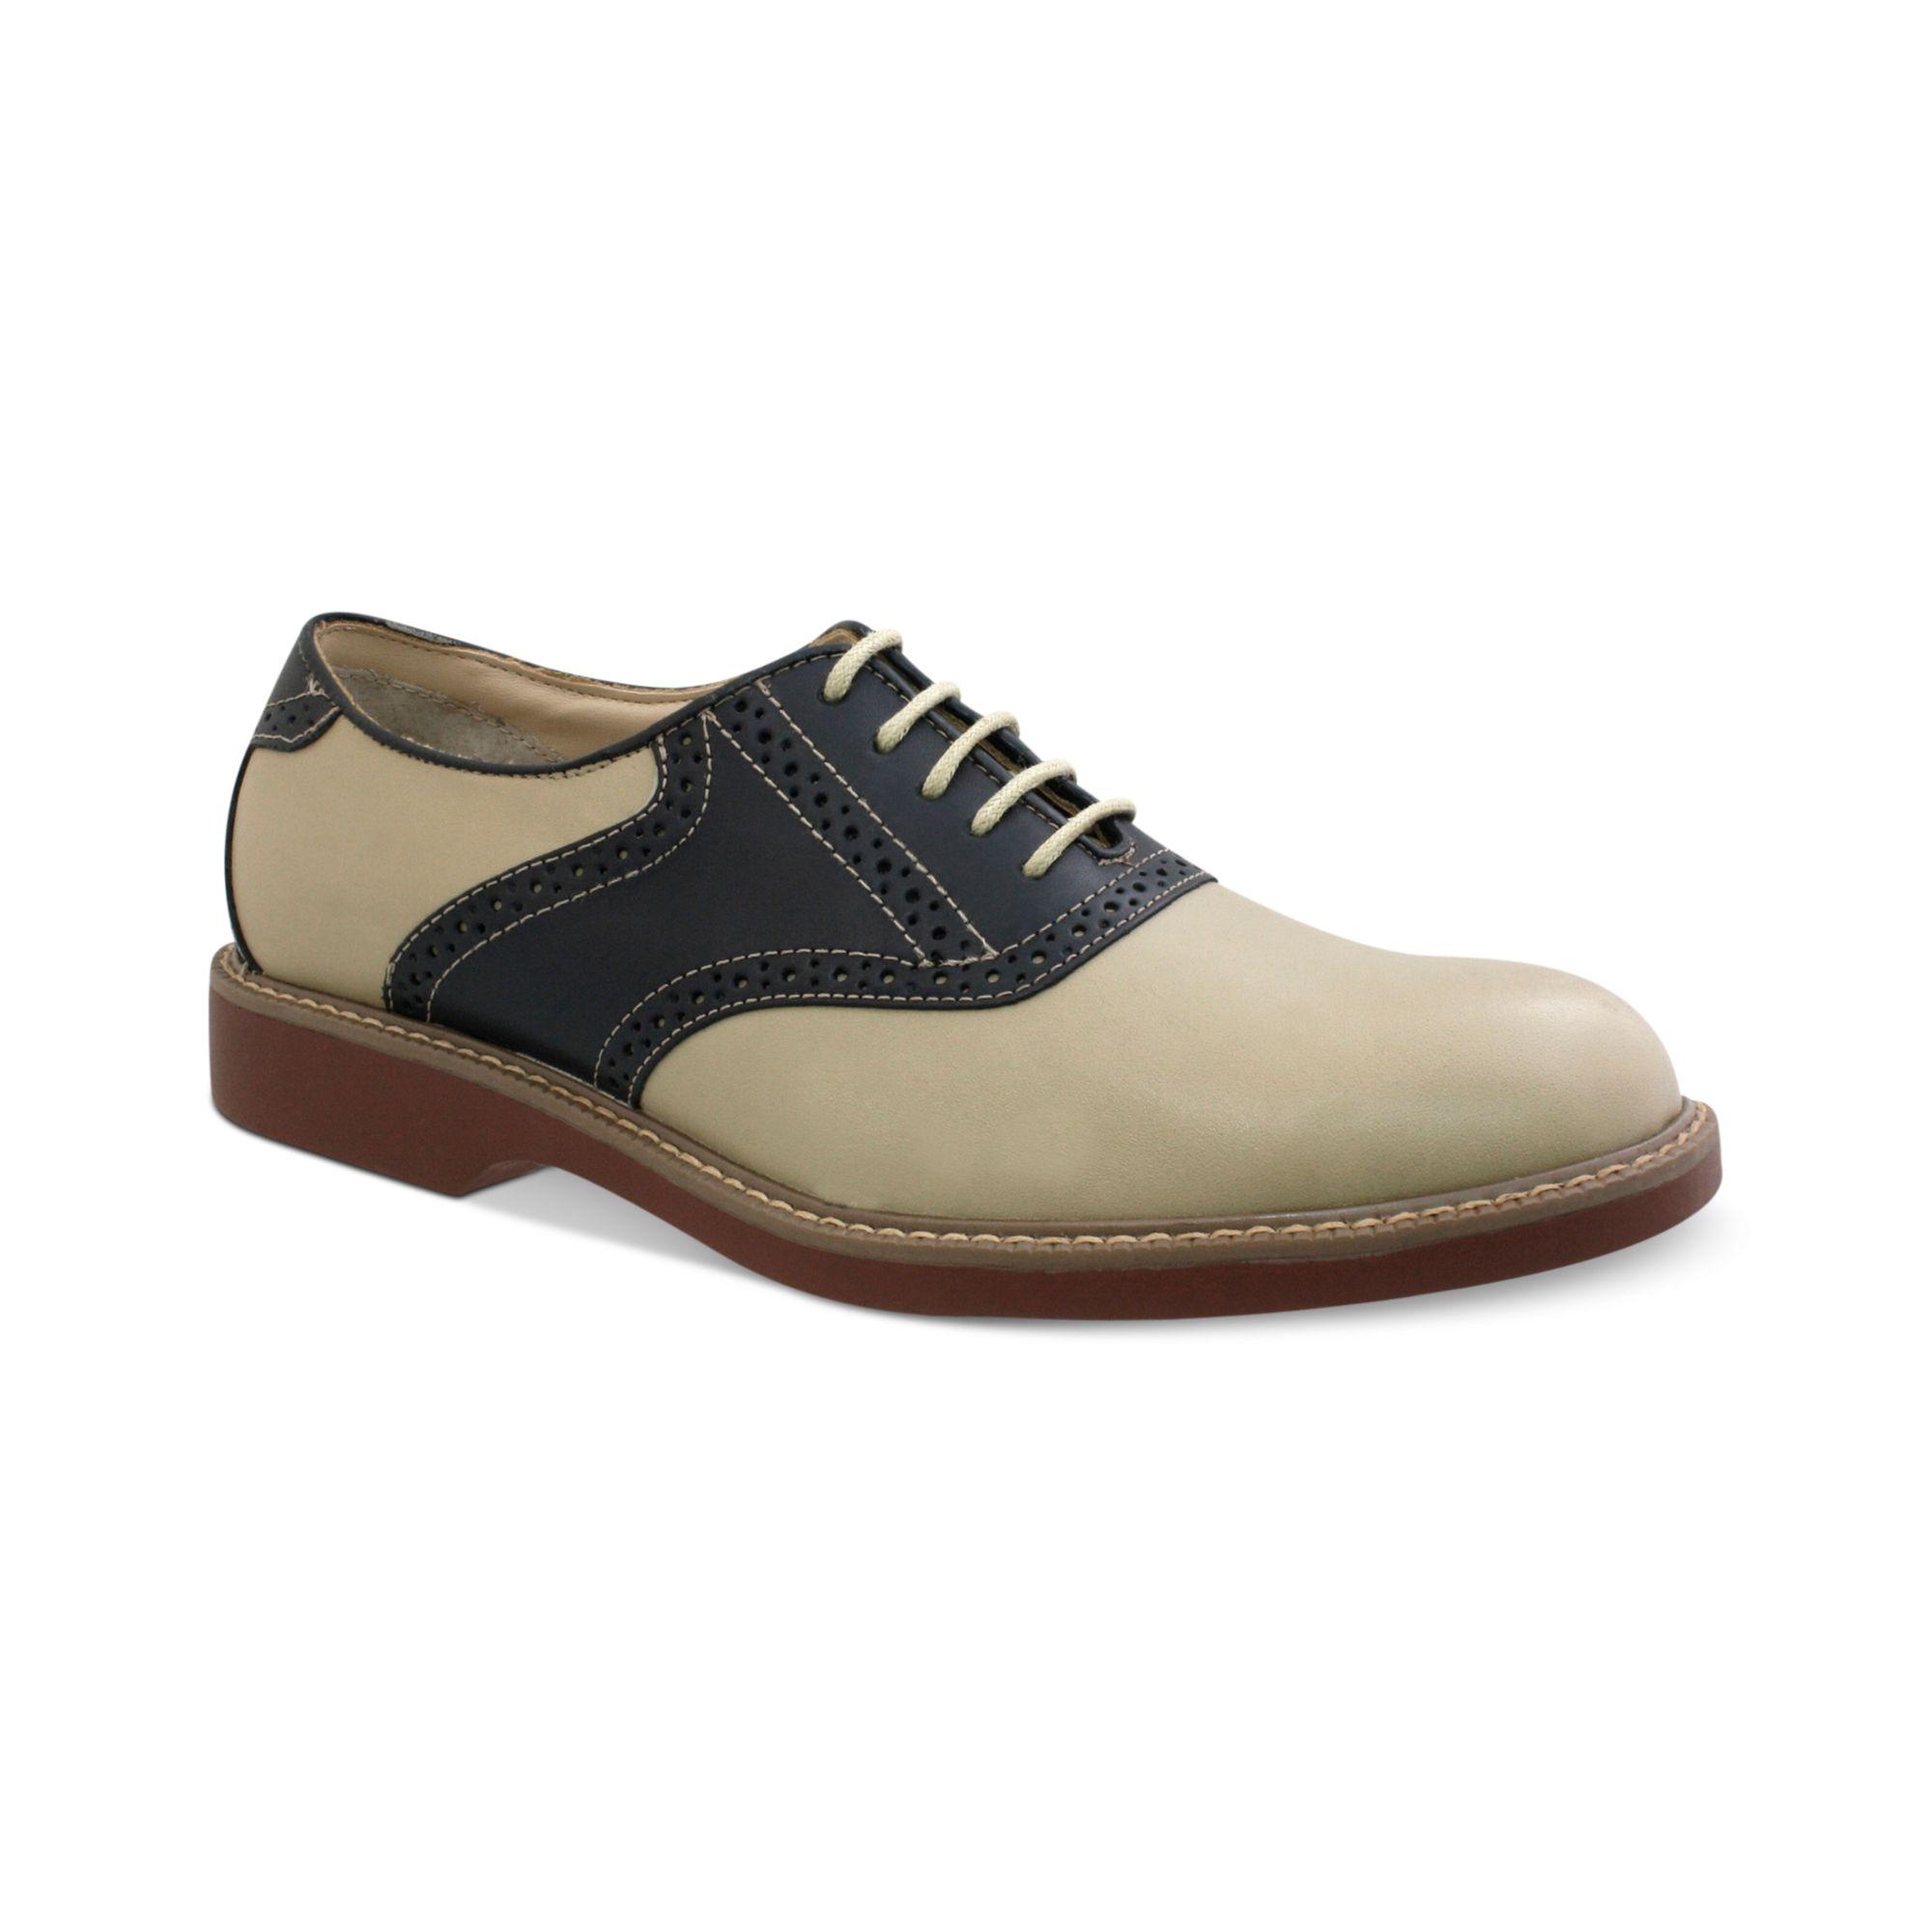 g h bass co pomona plain toe saddle lace up shoes in